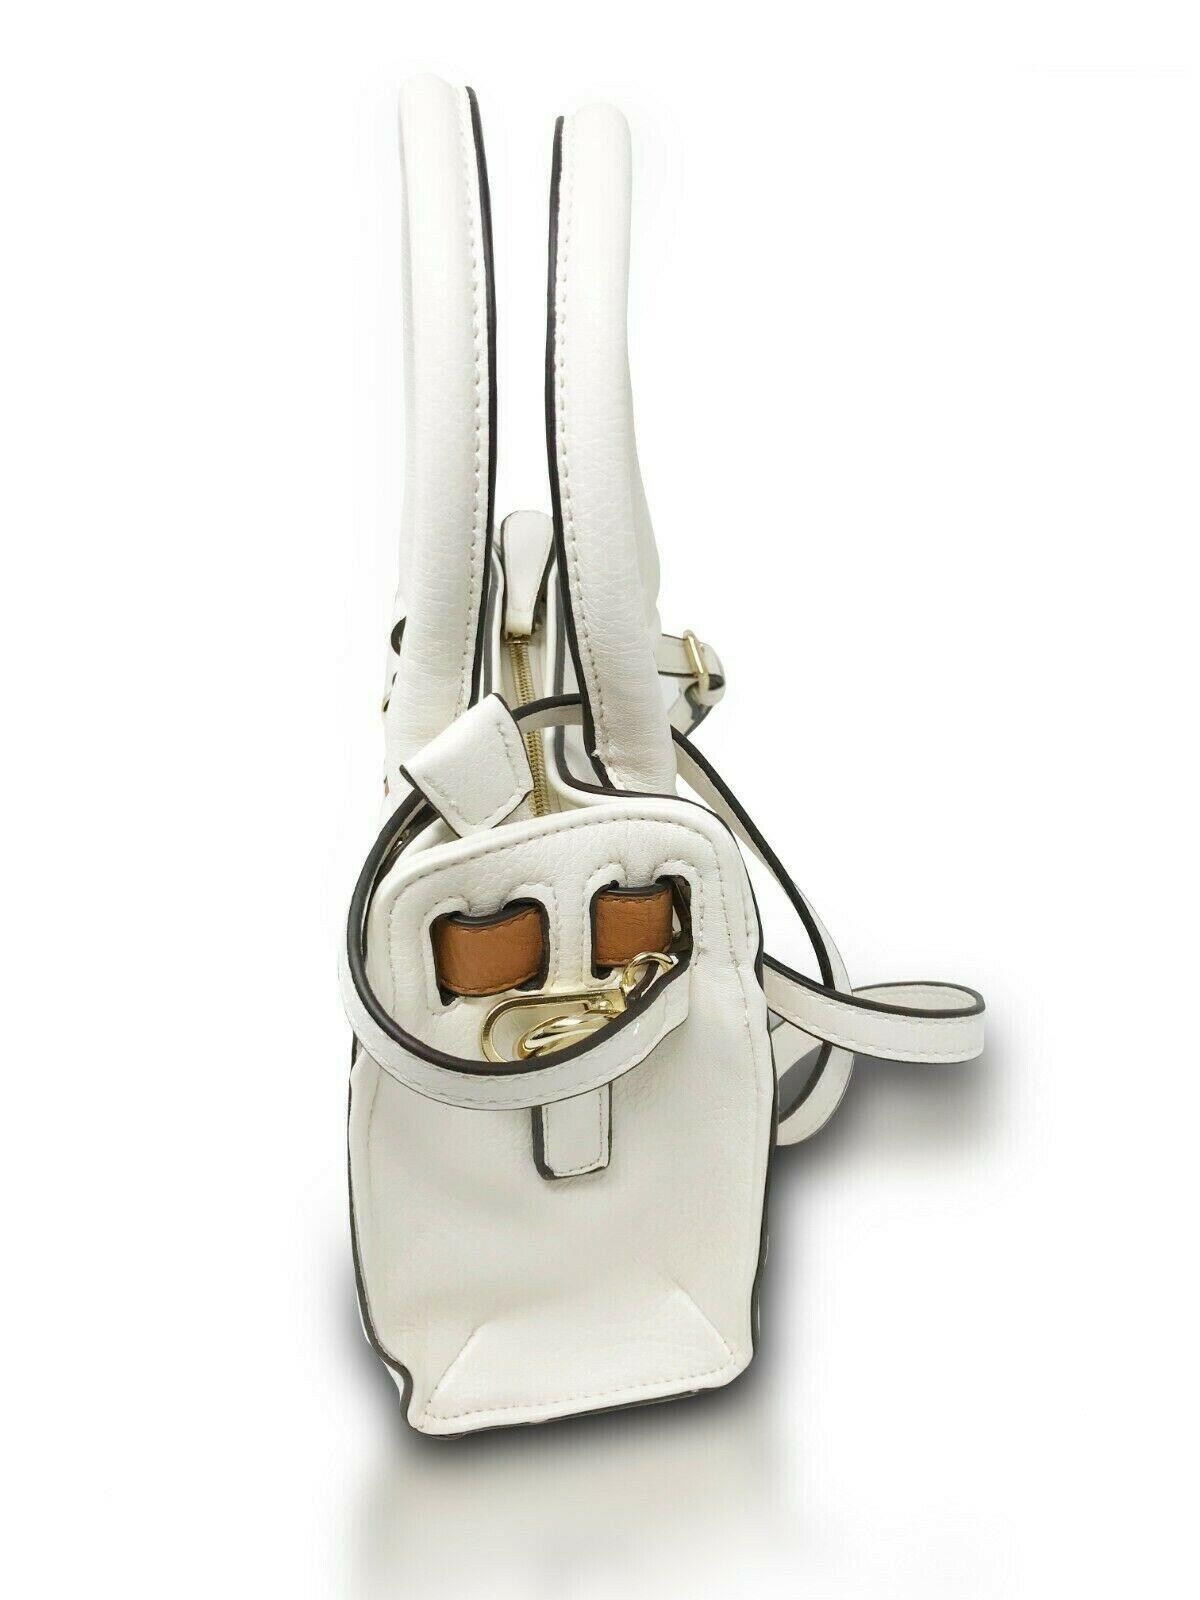 Mini Lady Hand-Bag Lockbox Satchel Cross-Body Bag Shoulder Bag with Strap